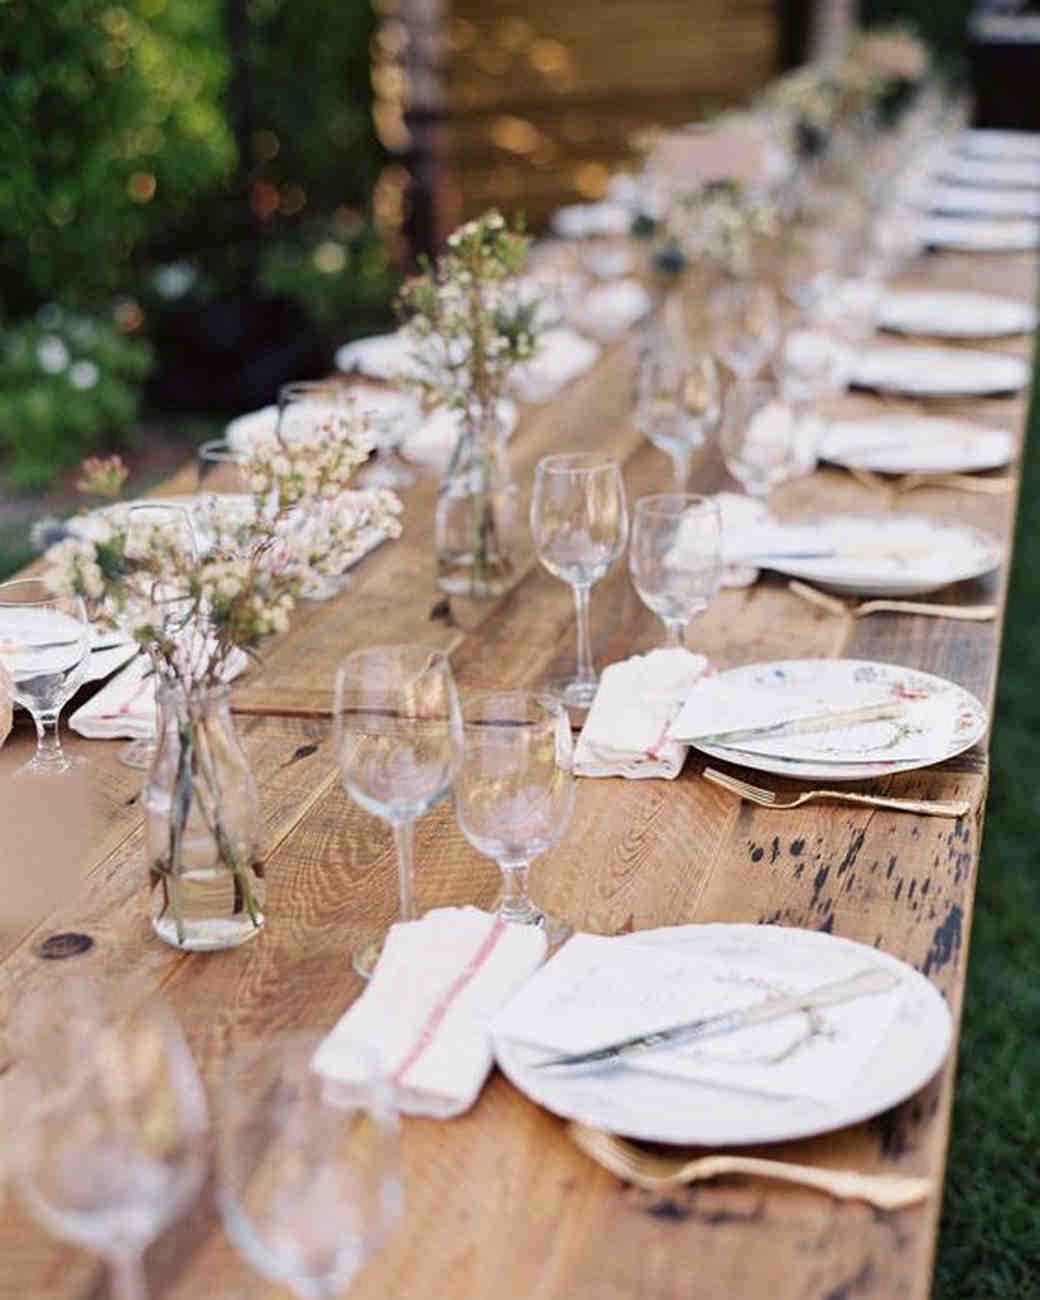 28 Of The Prettiest Rustic Wedding Centerpieces | Martha Stewart Weddings